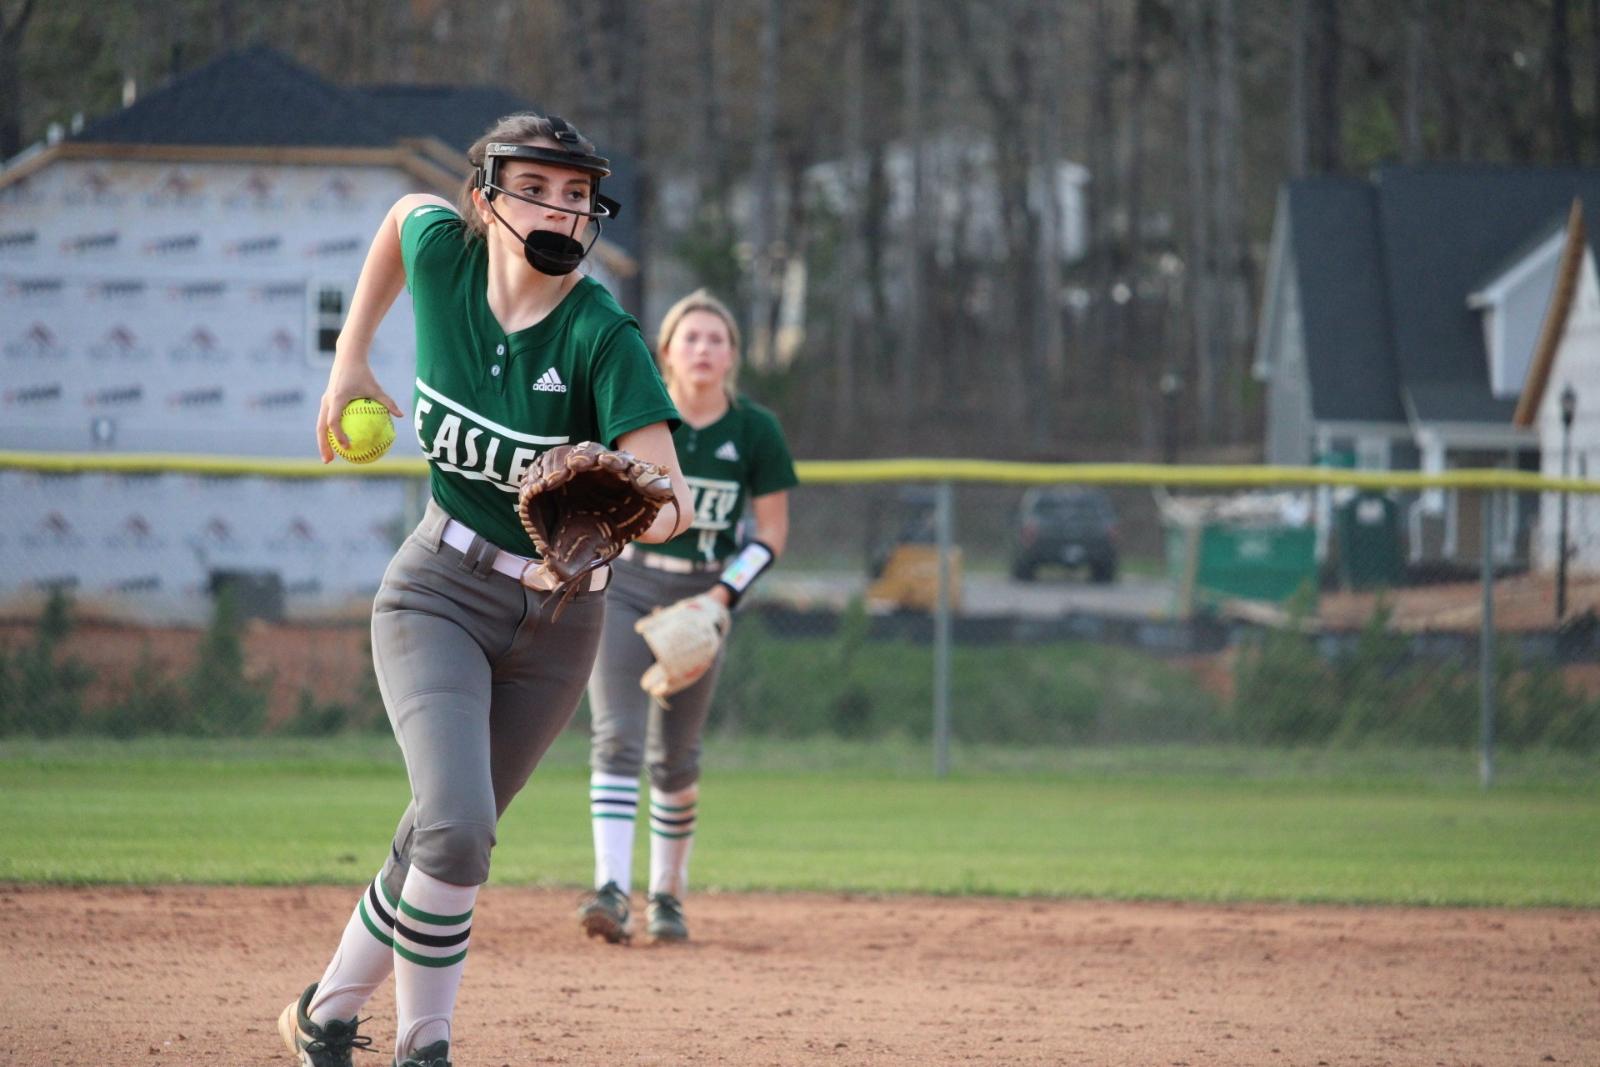 PHOTO GALLERY: Varsity Softball vs TR